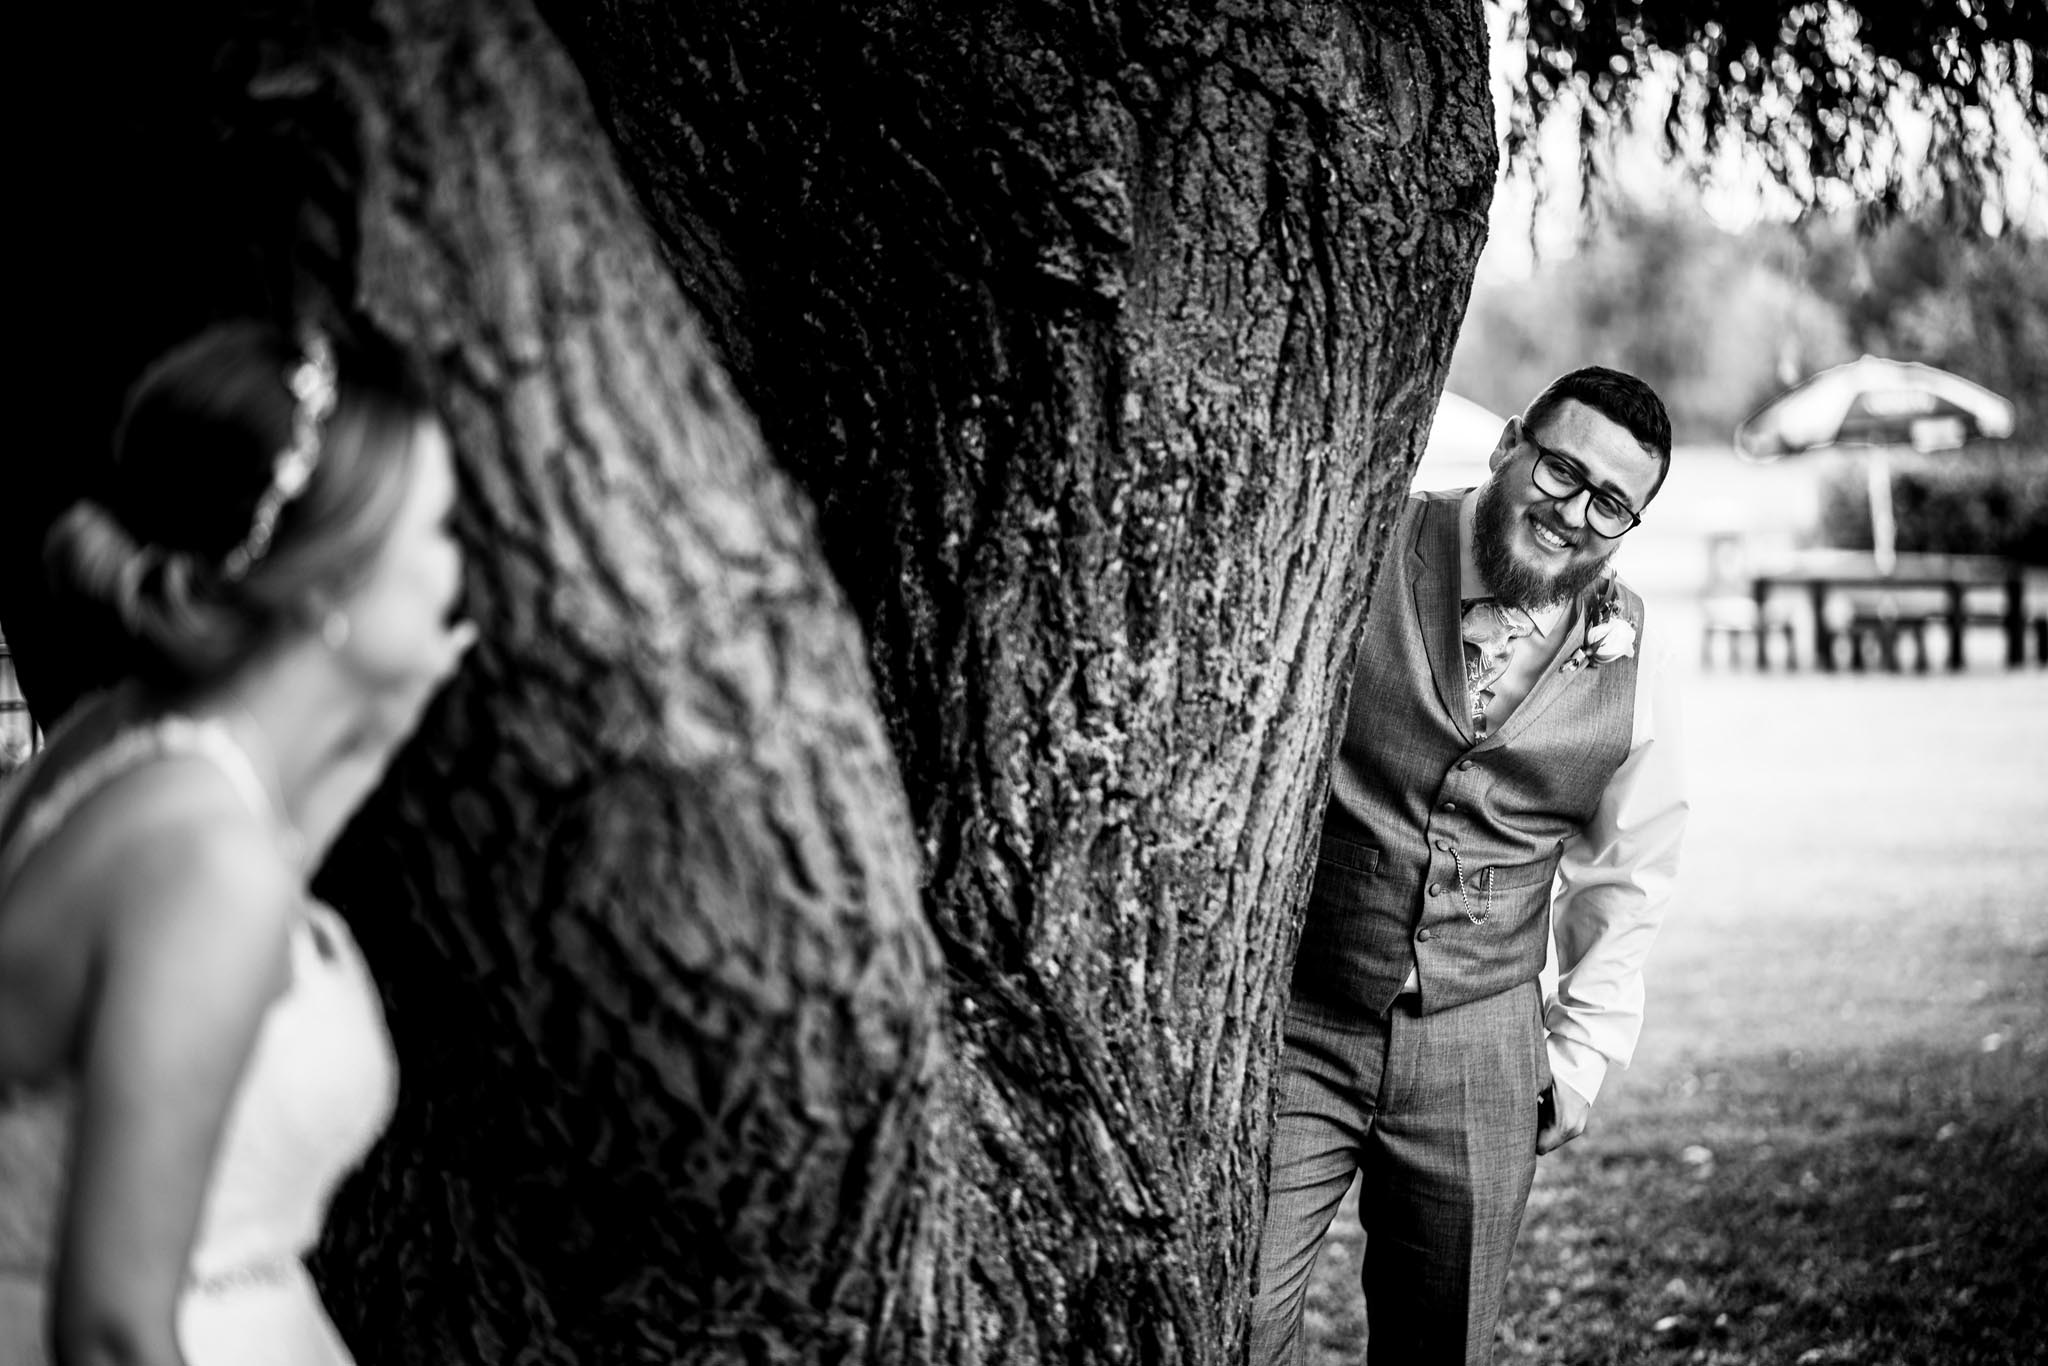 600-Bride-groom-Luke-Yasmin-The-Rayleigh-Club-Wedding-Photography.jpg